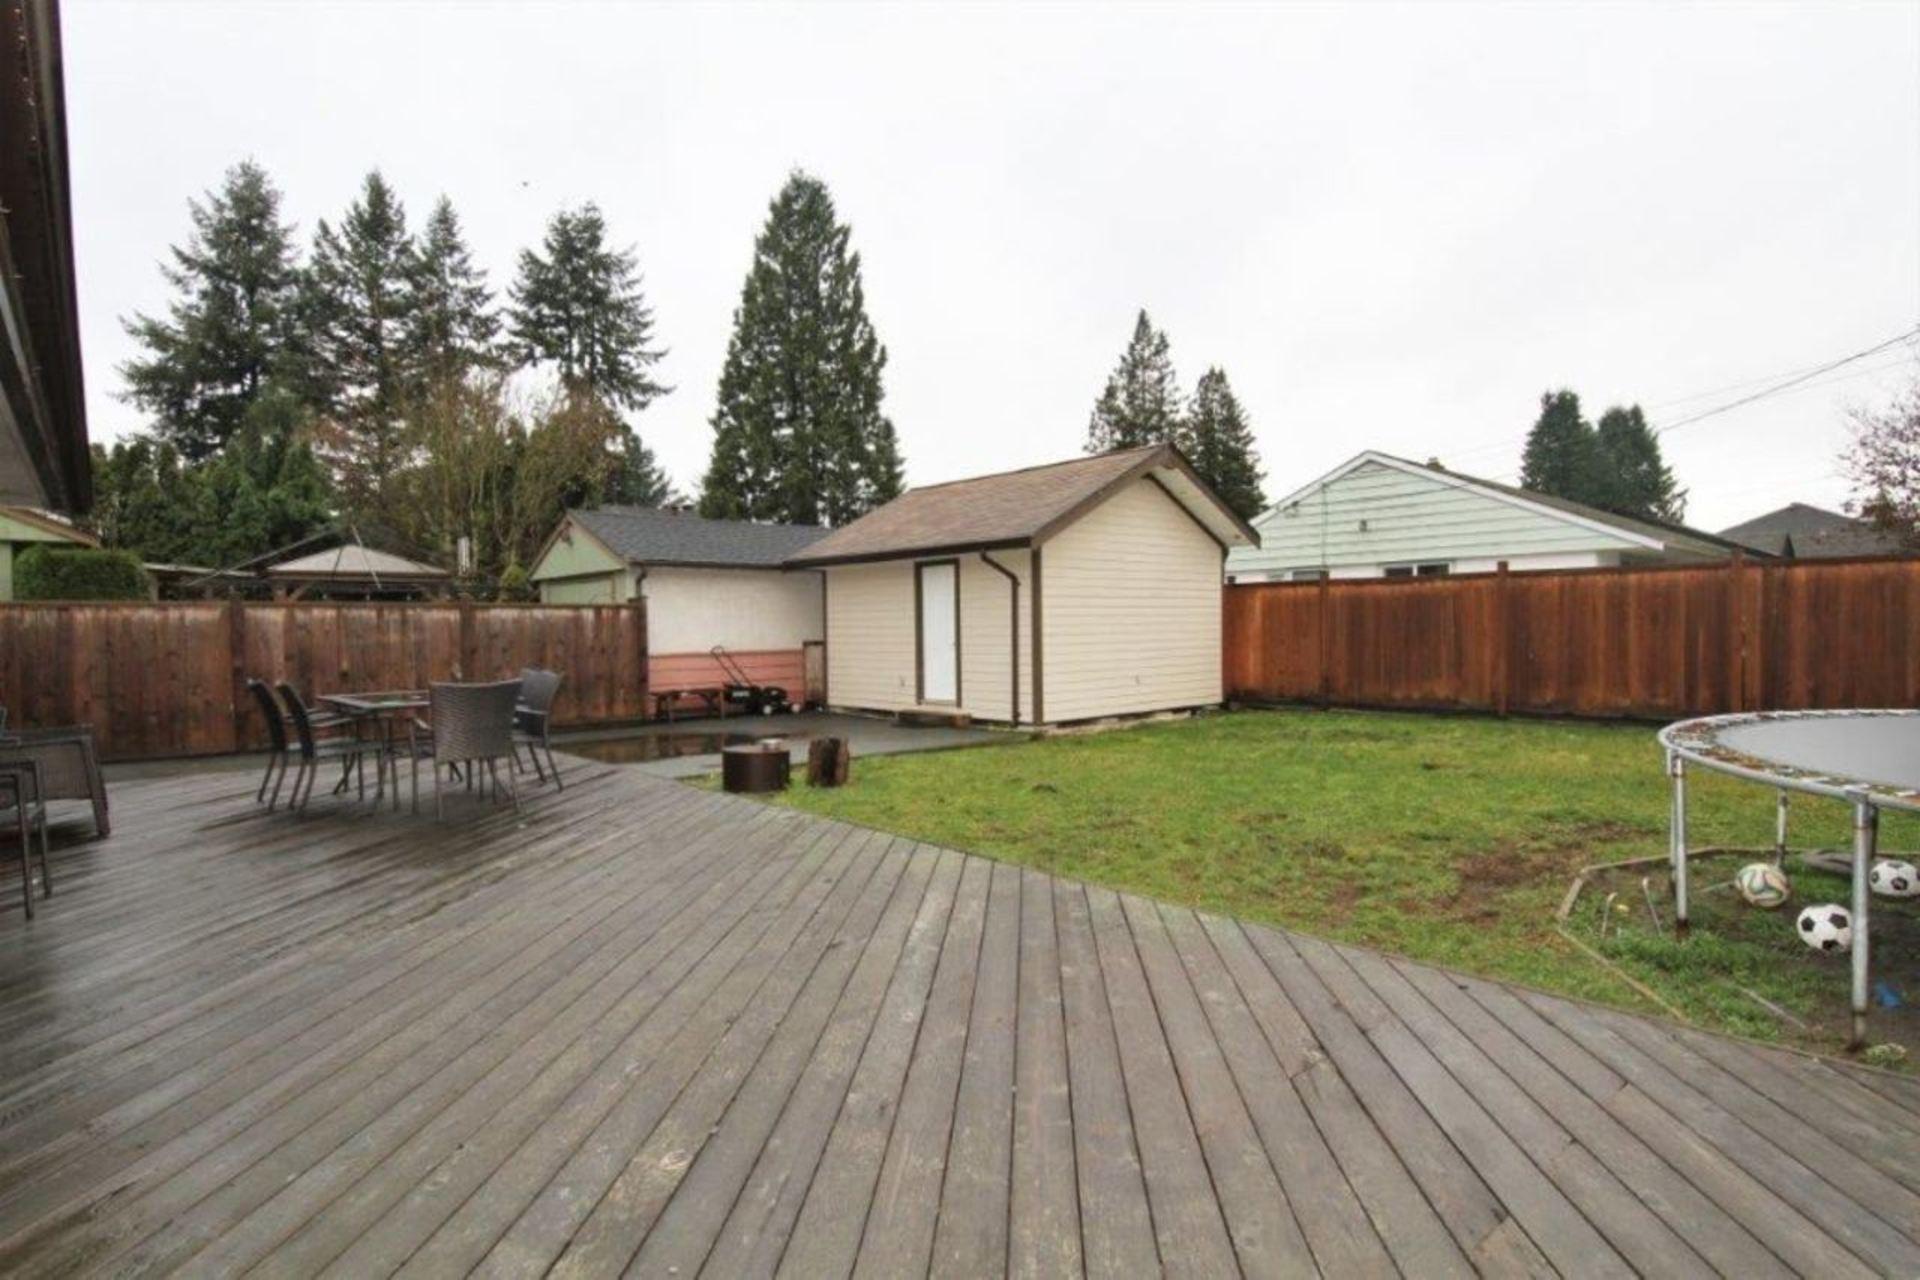 12351-203-street-west-central-maple-ridge-12 at 12351 203 Street, West Central, Maple Ridge